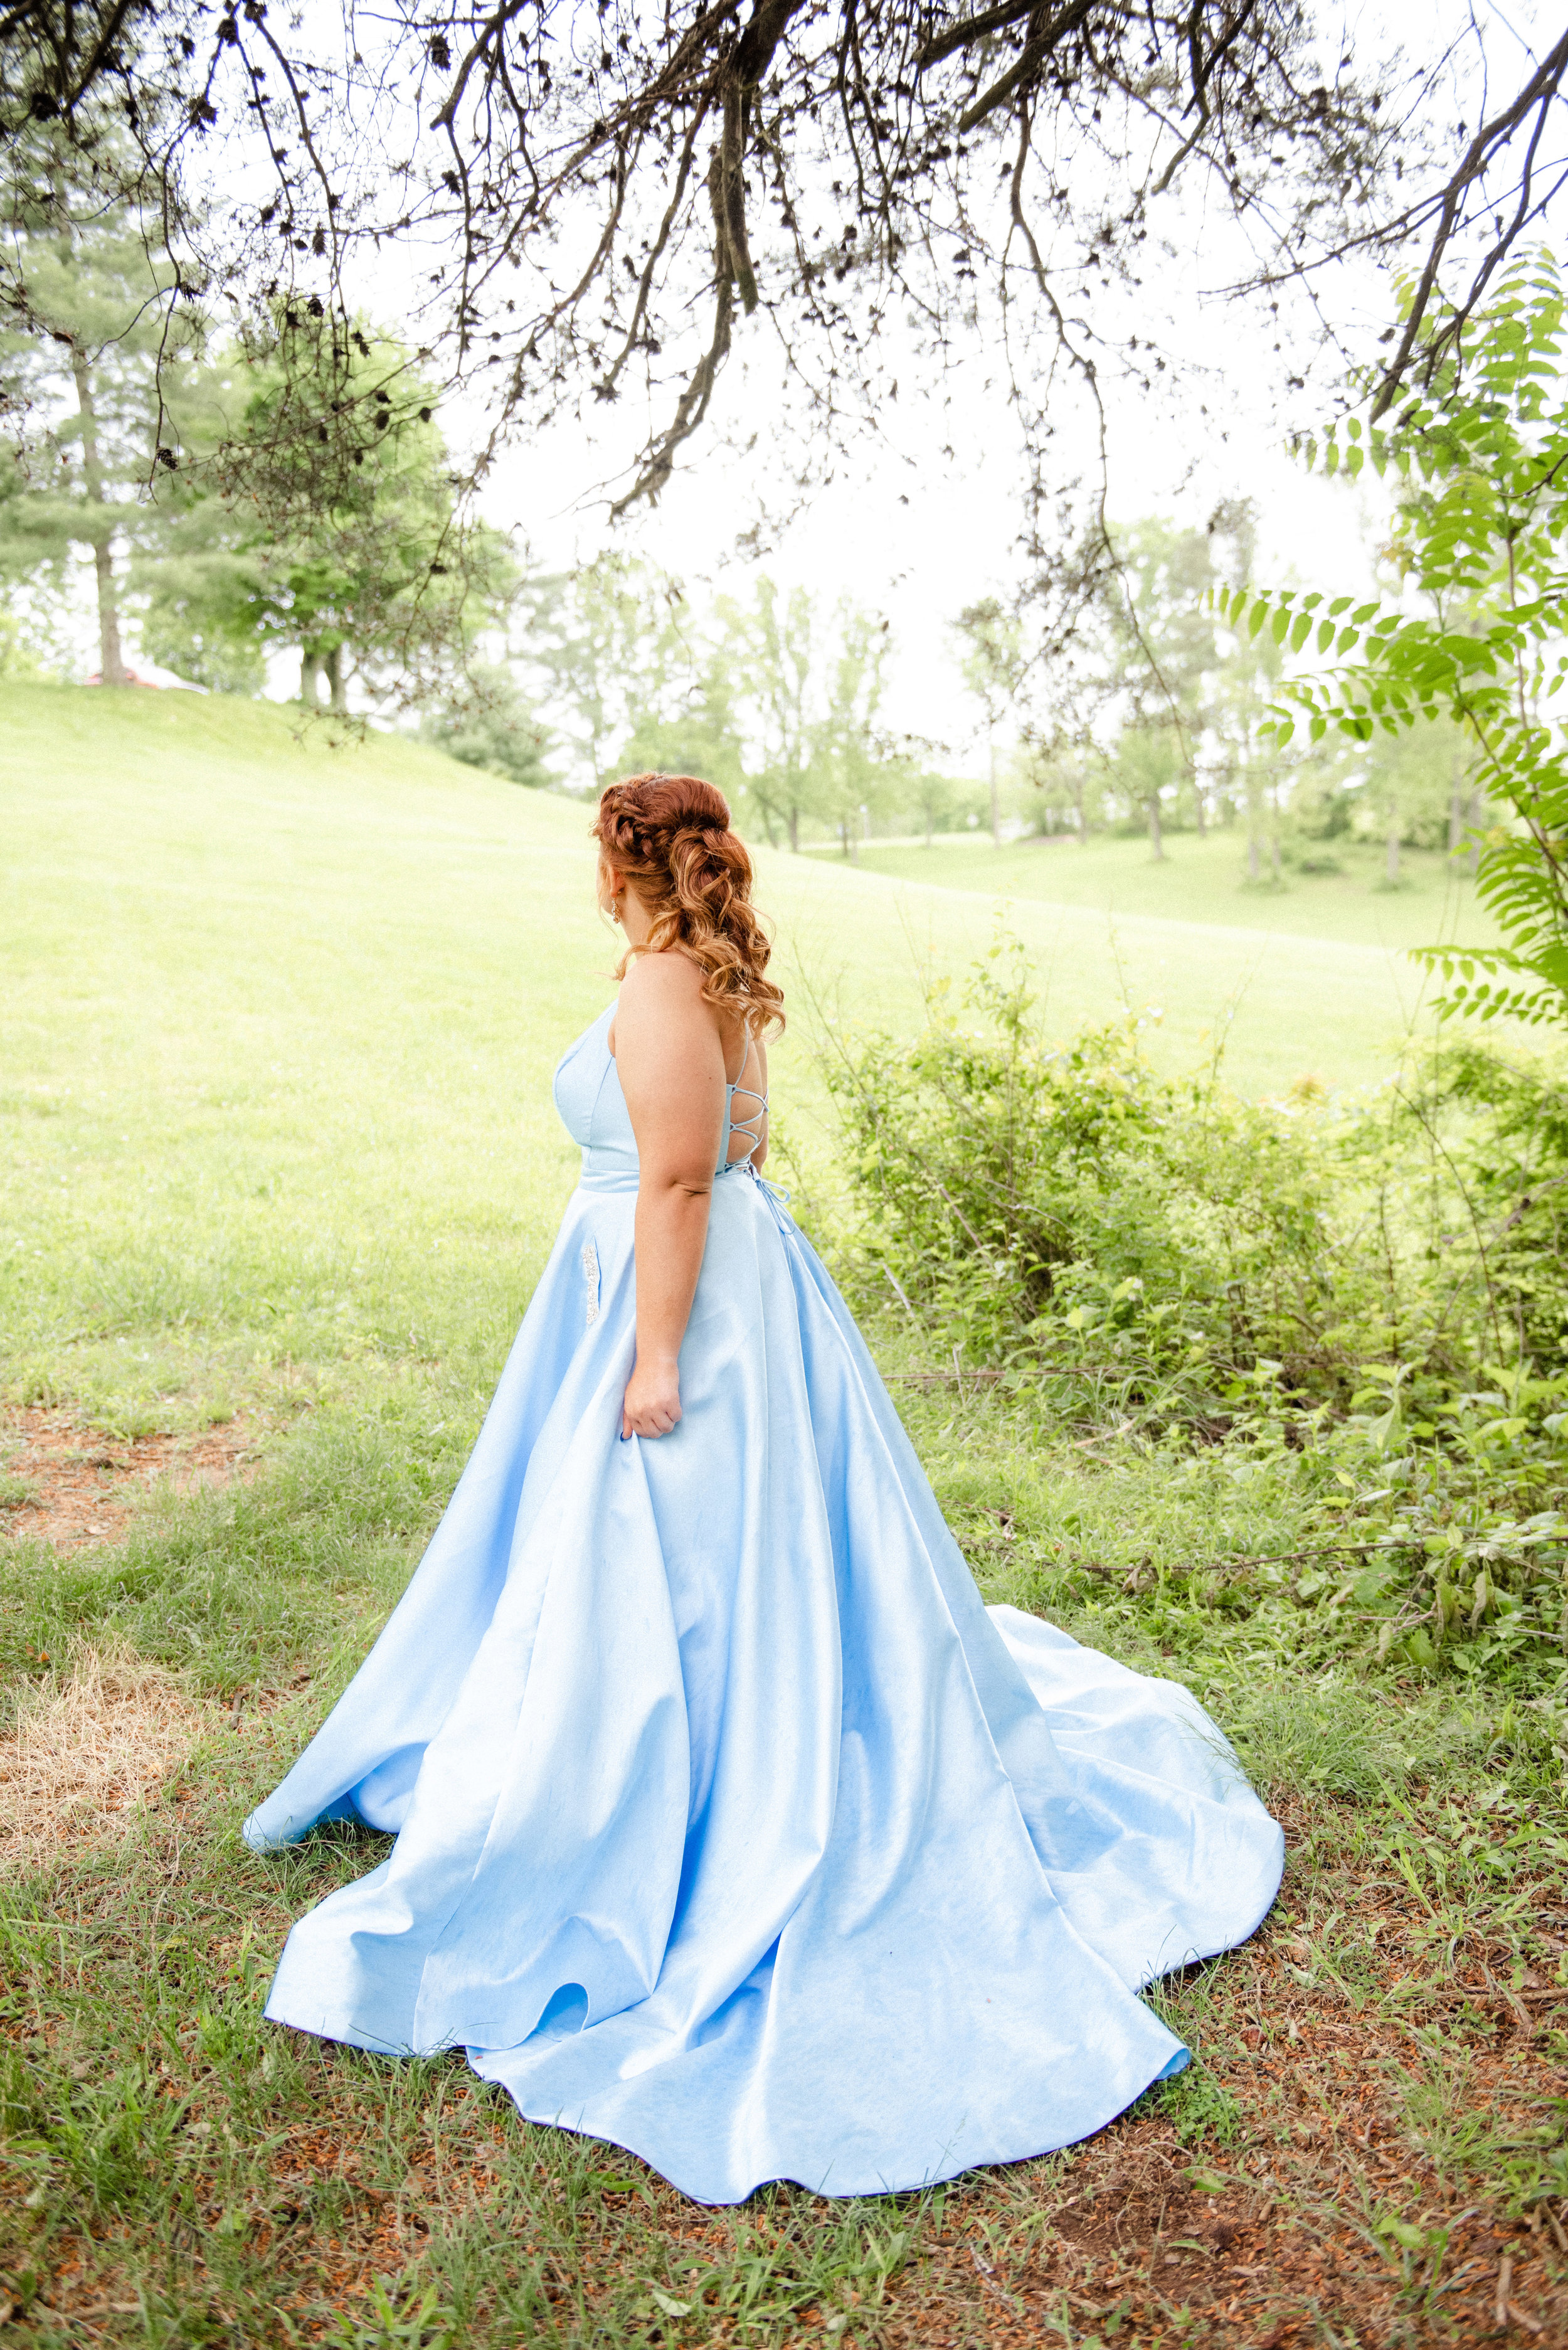 AbigailBunch-Prom-31.jpg